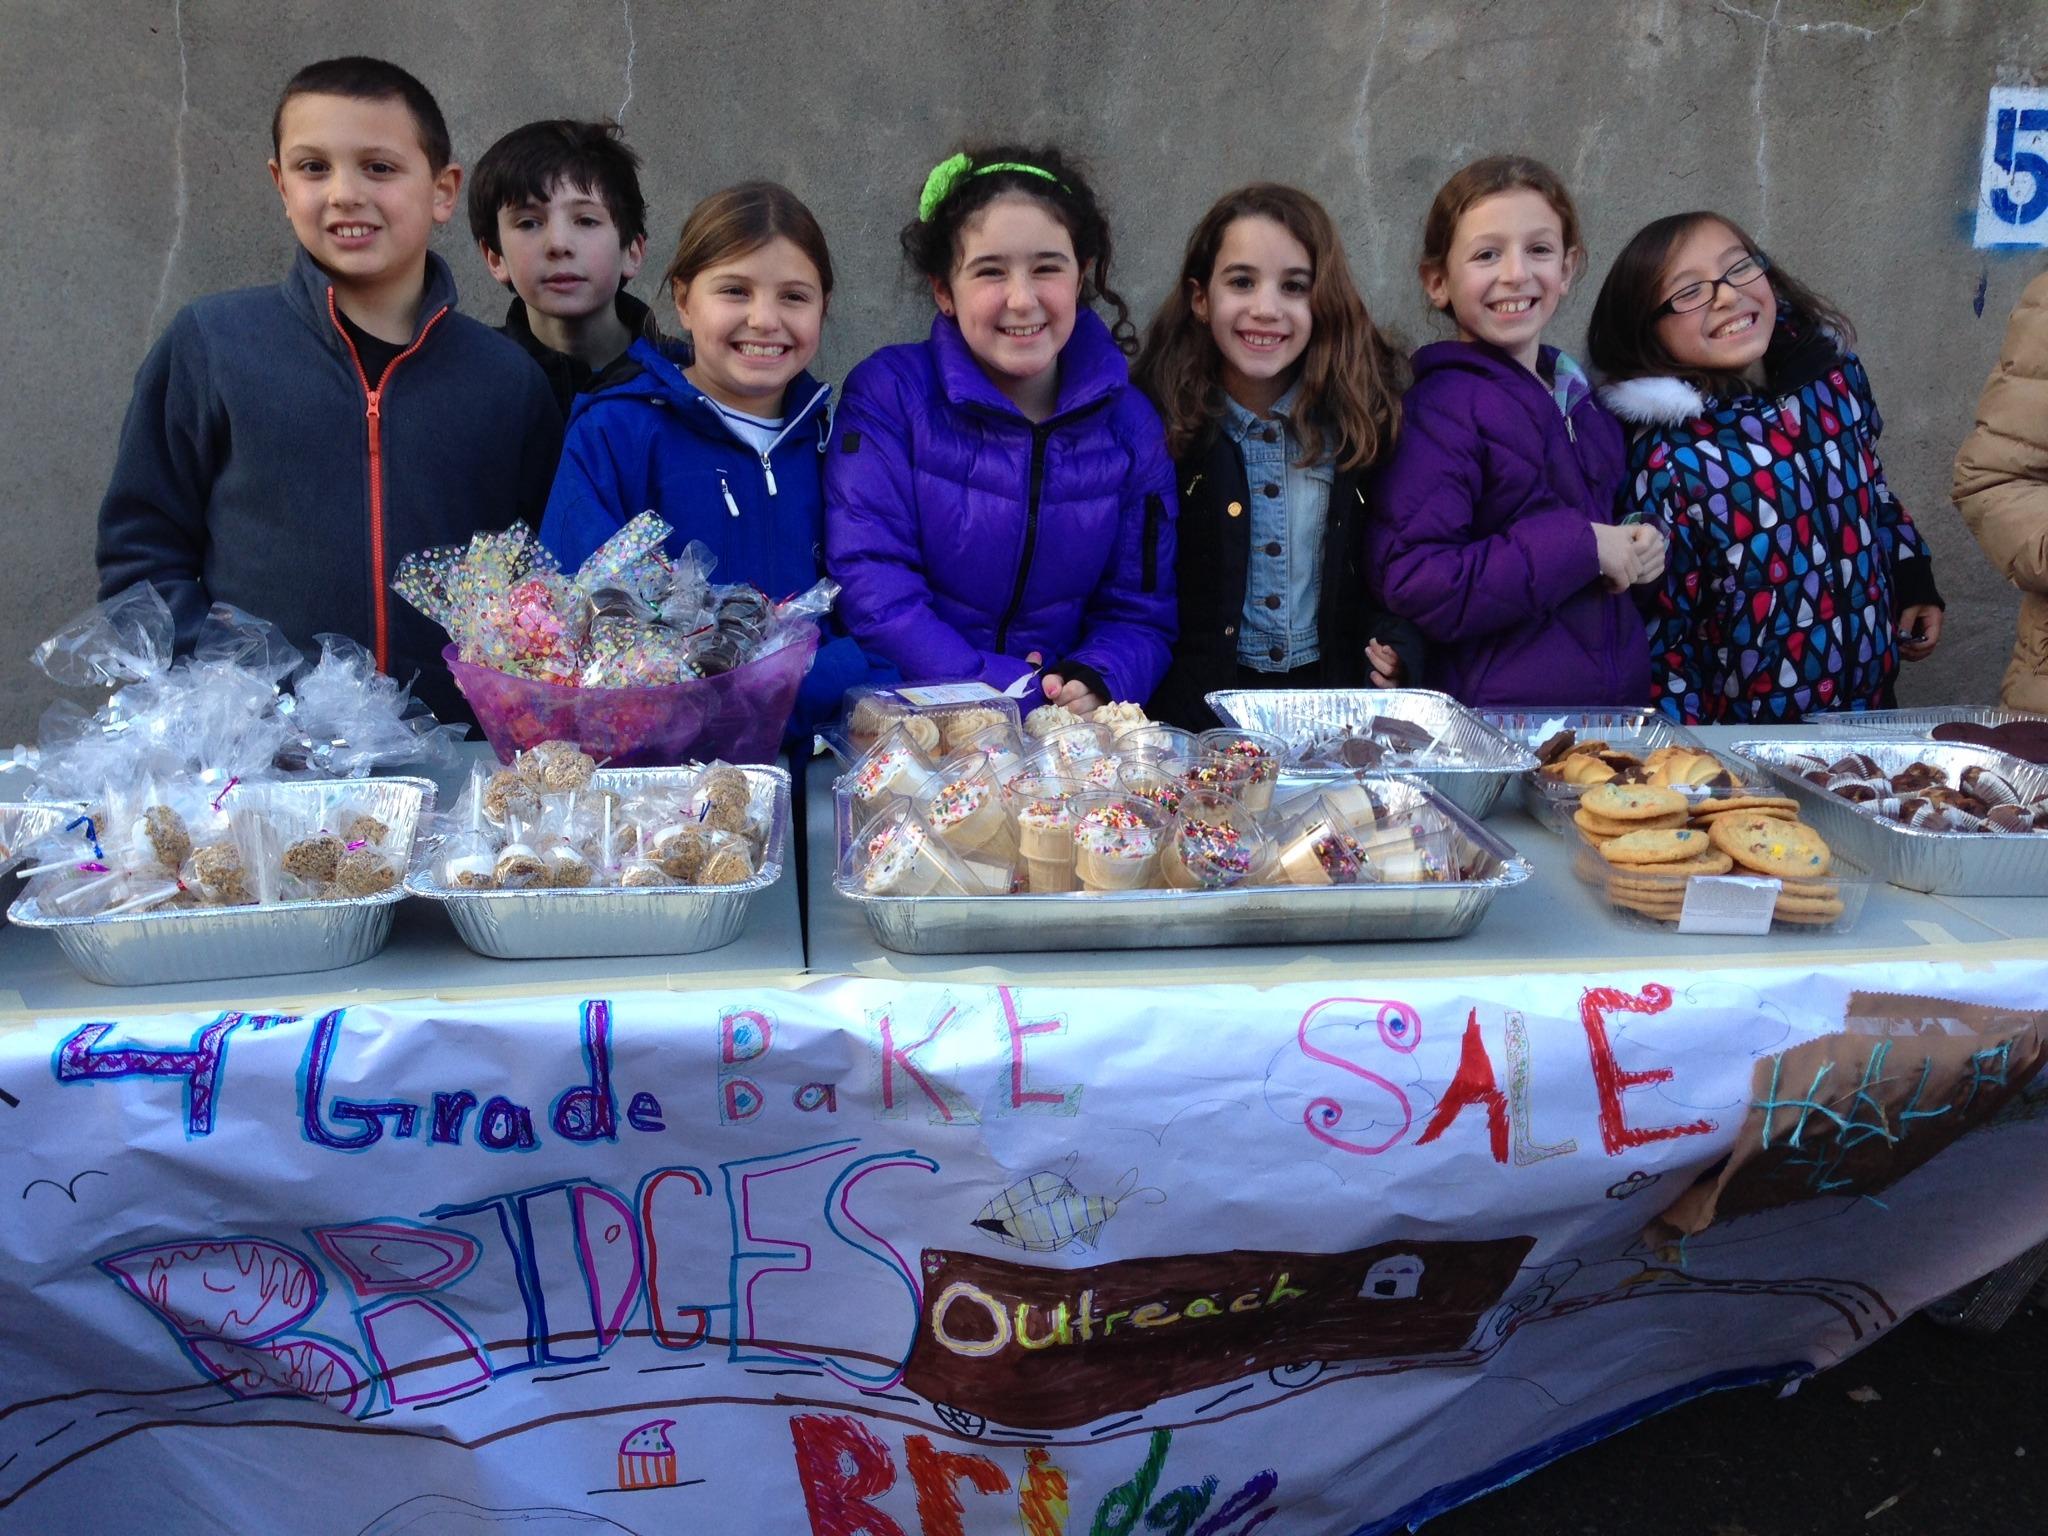 1380cbb13c7a6147571a_Wyoming_School_4th_graders_hosting_a_bake_sale__fundraiser.jpg